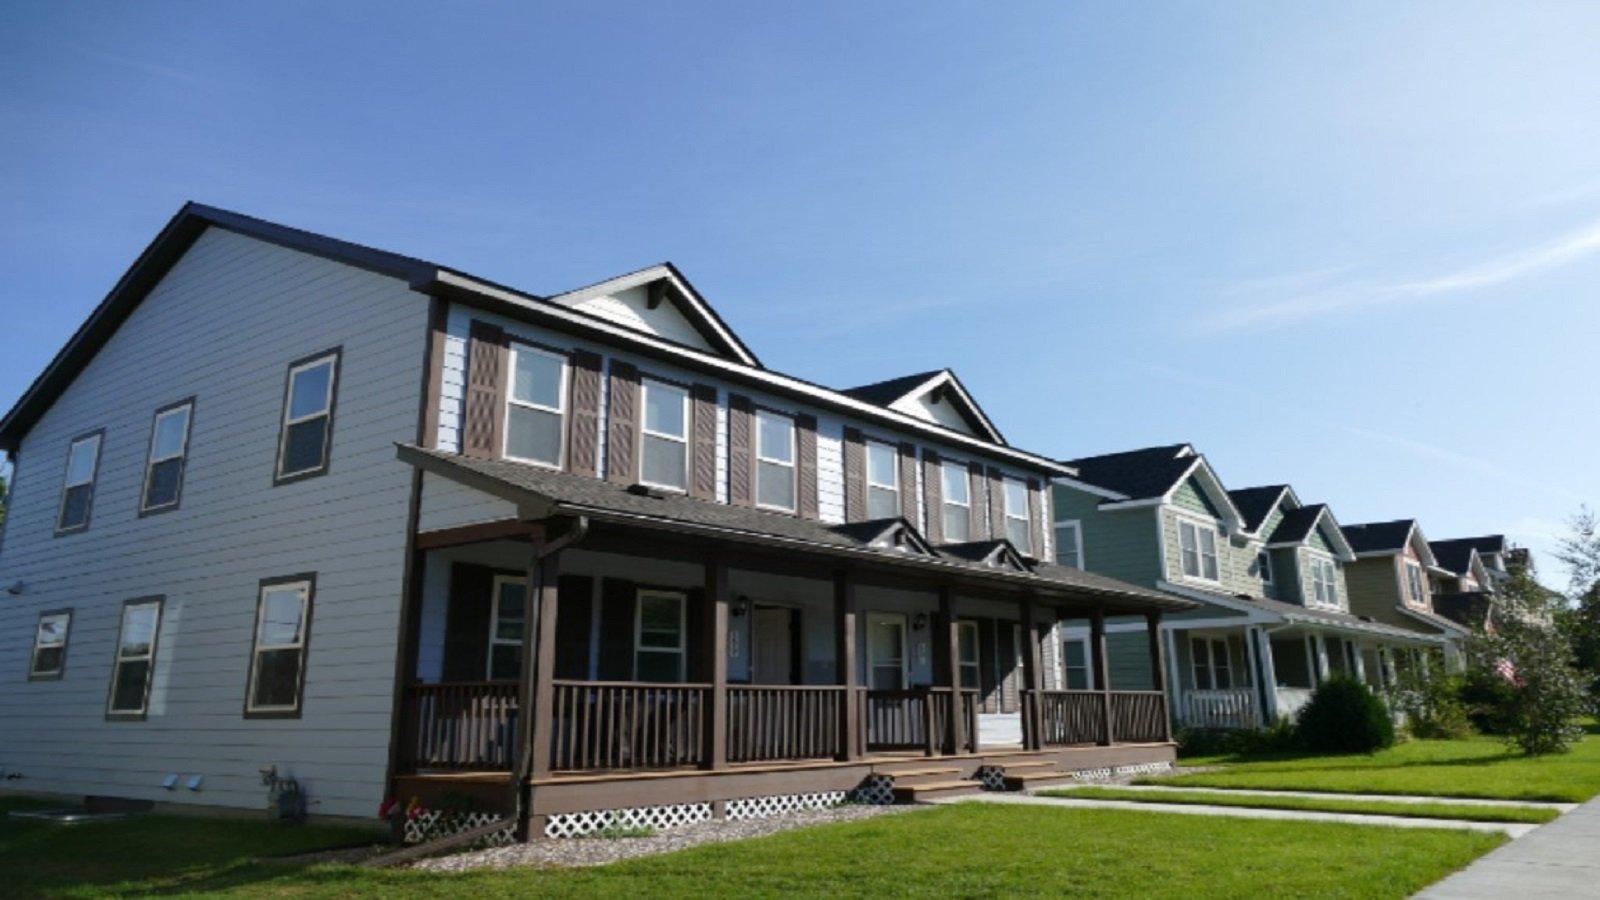 Habitat houses